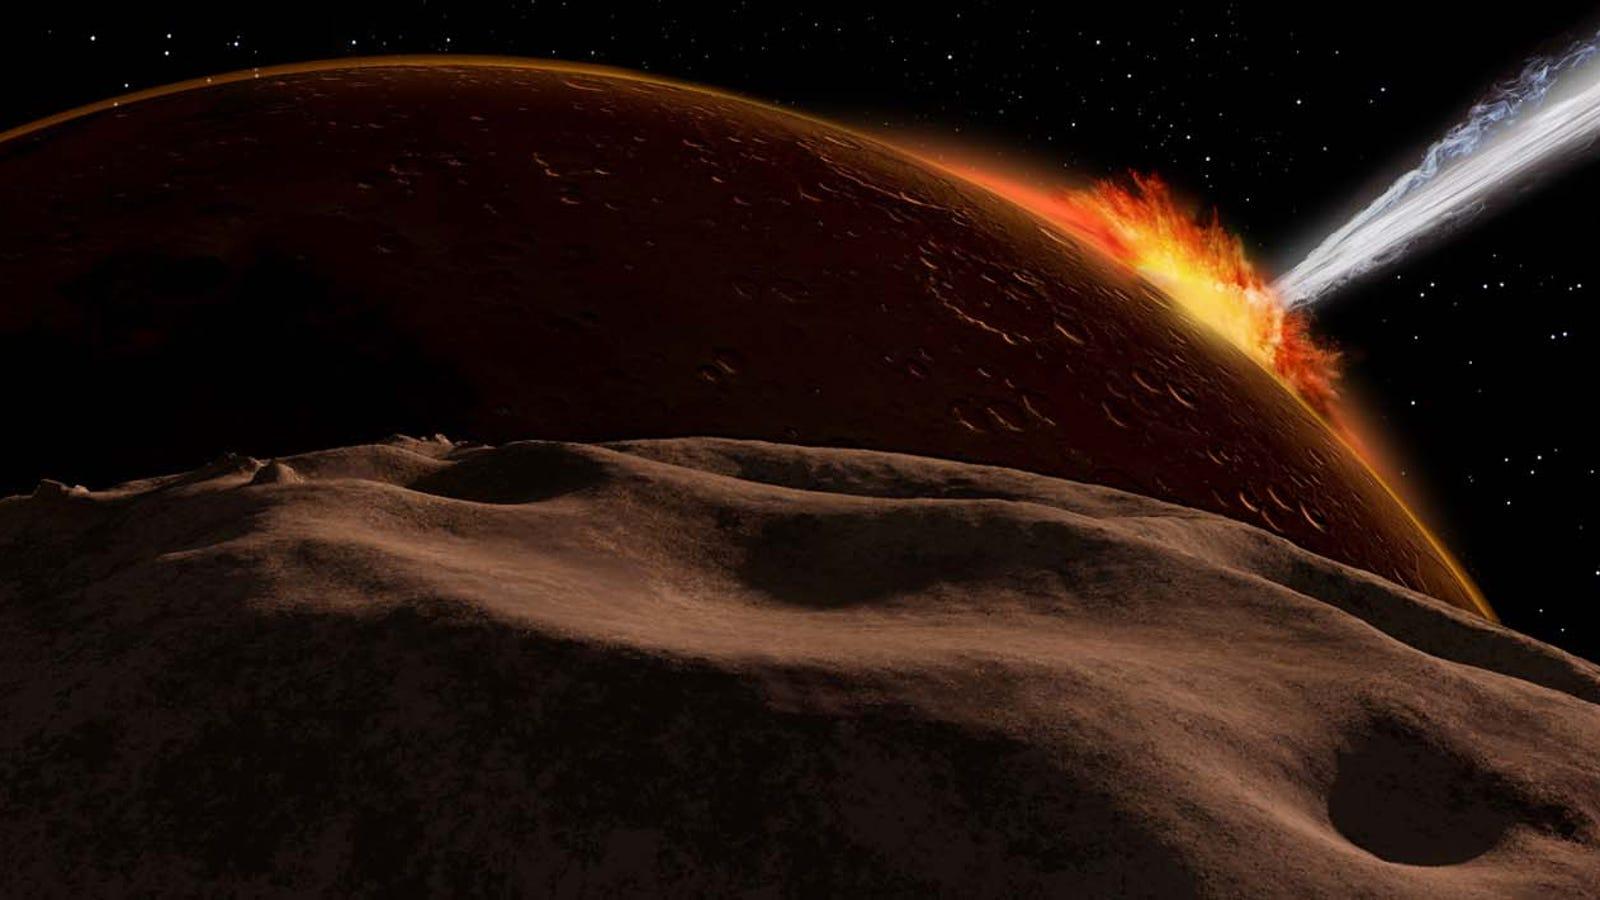 asteroid vs comet - photo #17